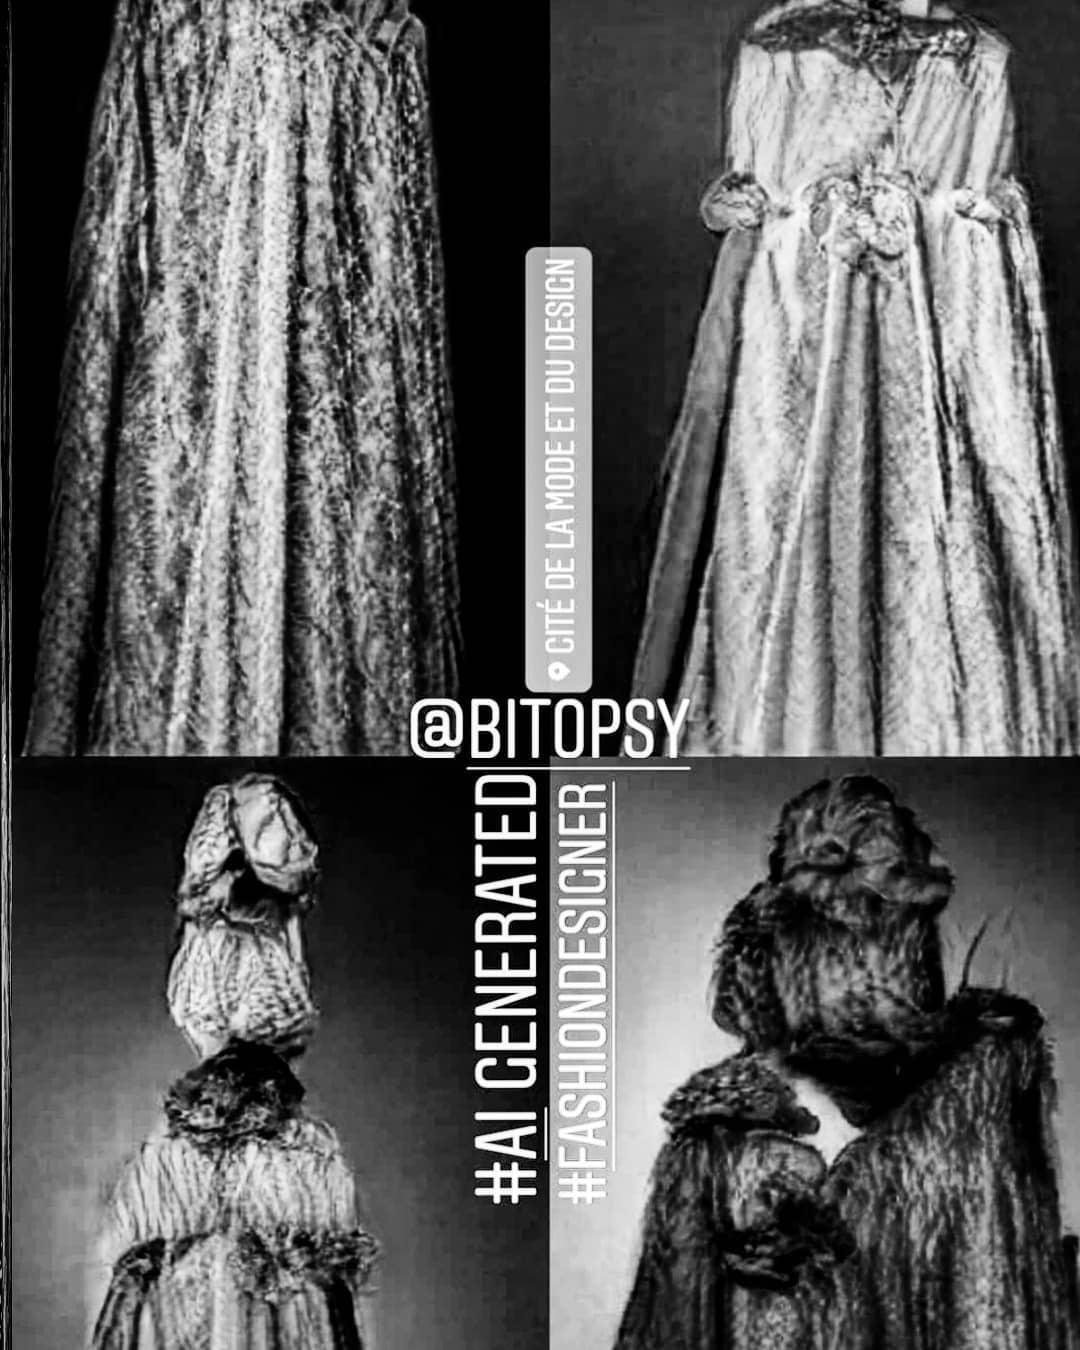 Photo Noir Et Blanc Design alagraphy black and white [monochrome] photography